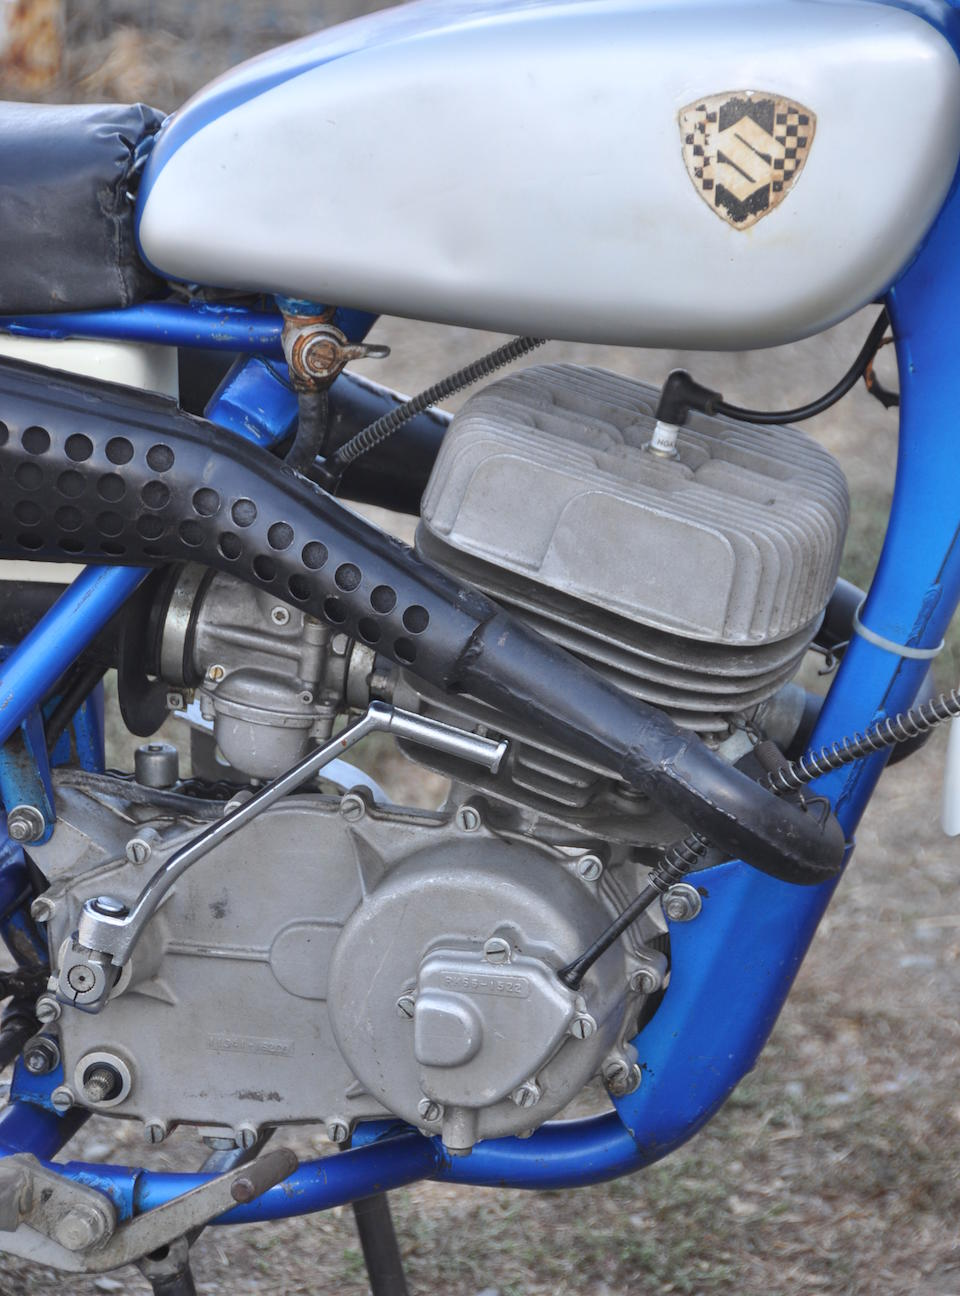 Japan's first production MX racer,1968 Suzuki RH67 Frame no. TM250-10113 Engine no. TM250-10113